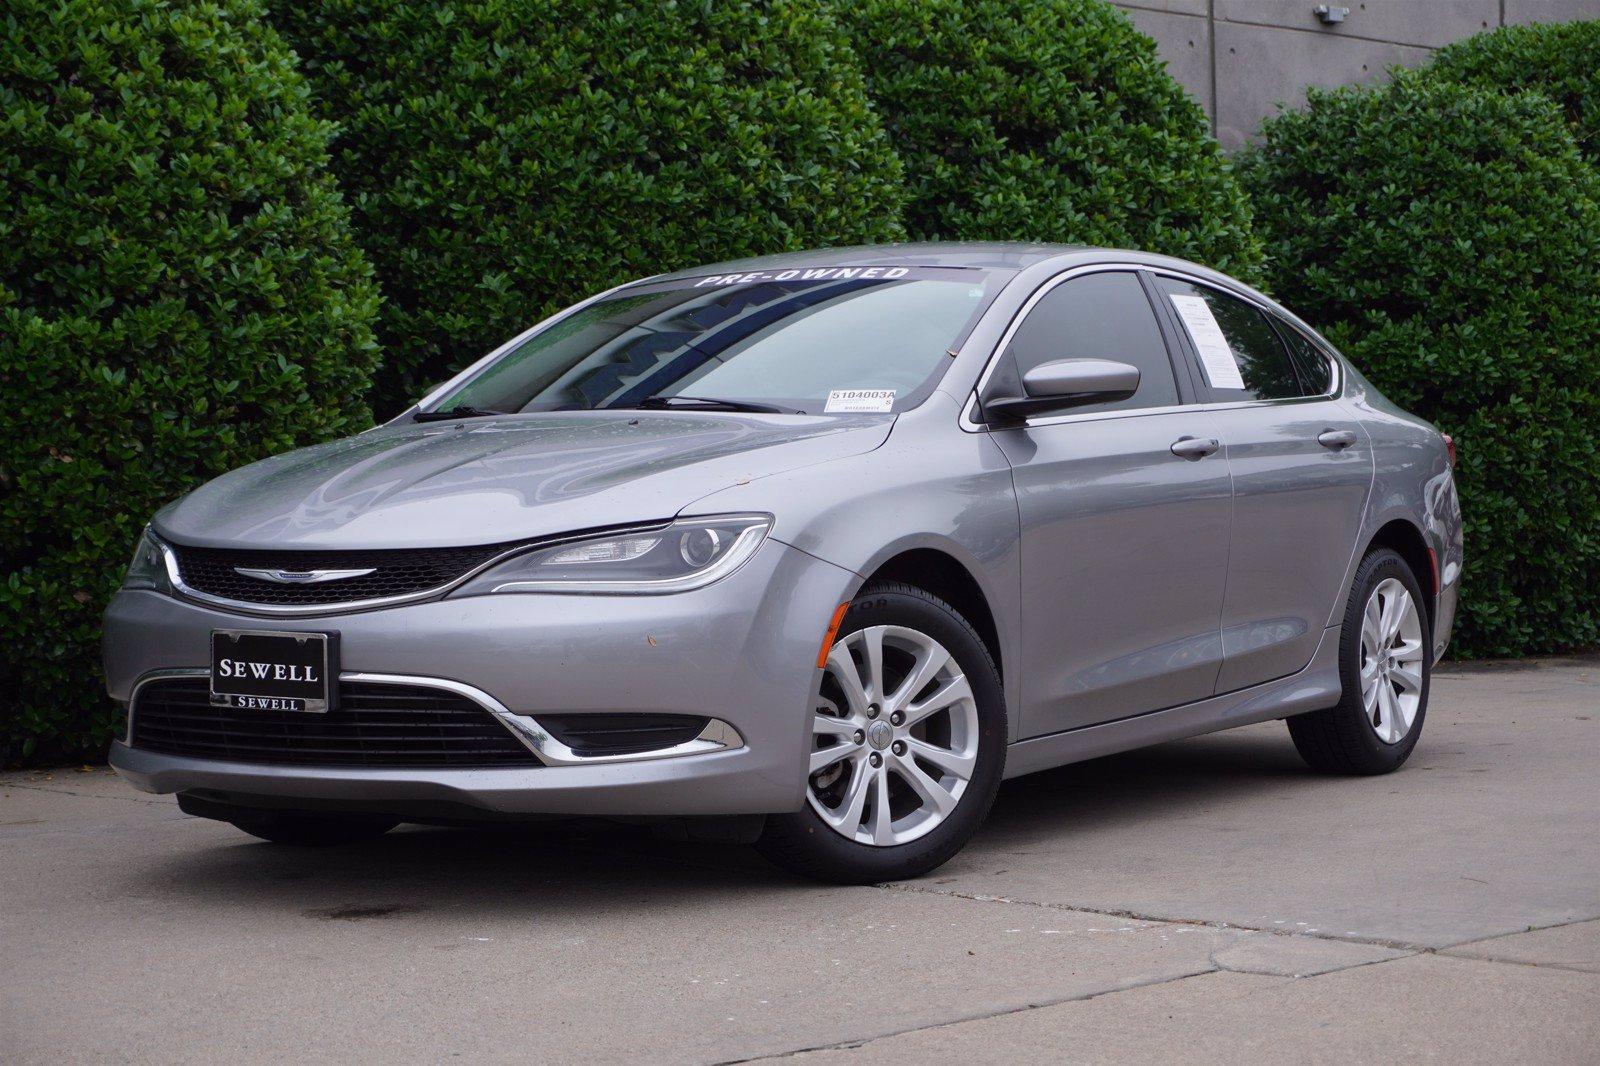 2015 Chrysler 200 Vehicle Photo in Dallas, TX 75209